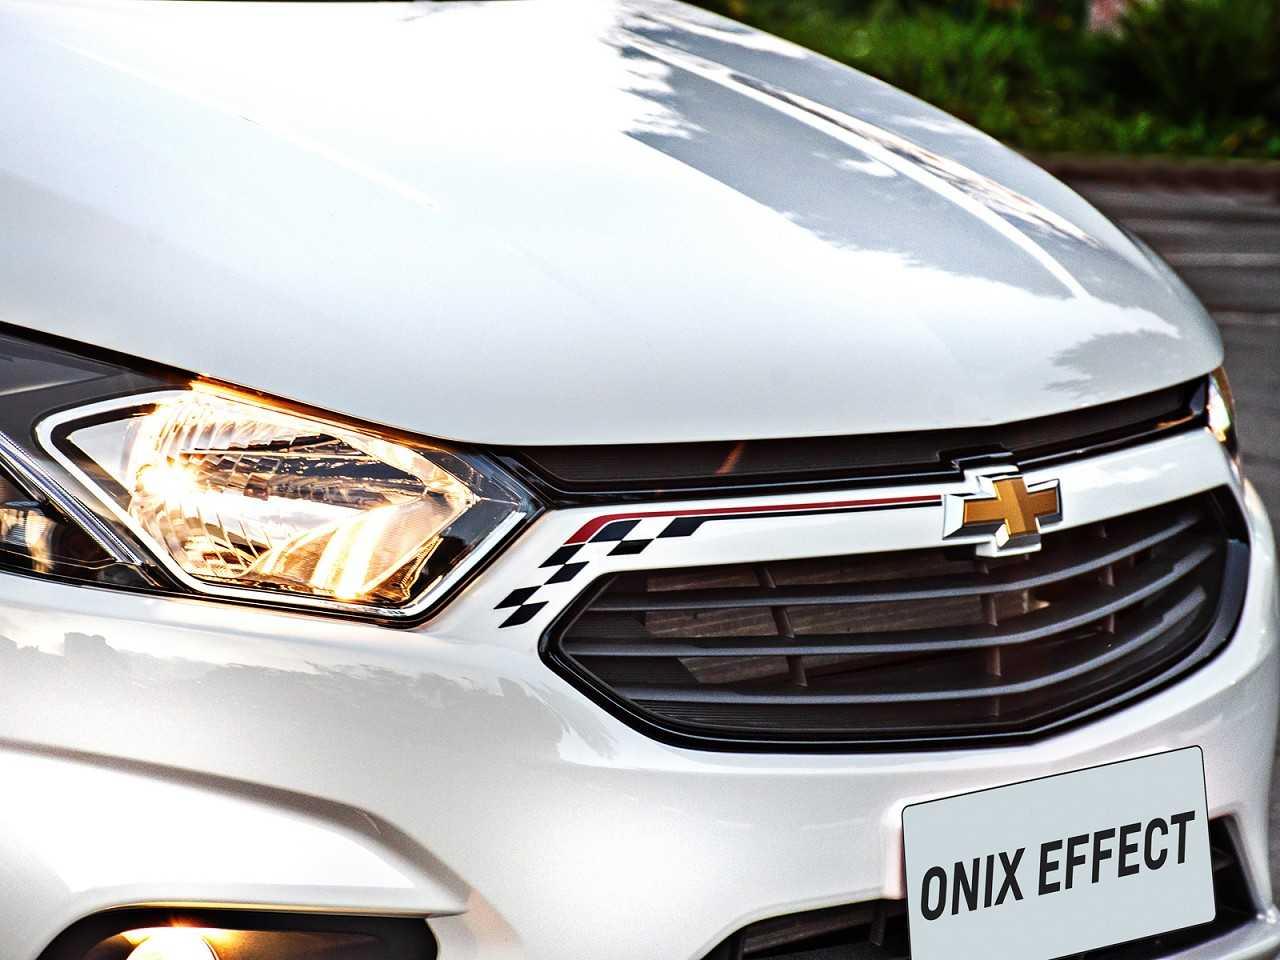 ChevroletOnix 2018 - grade frontal